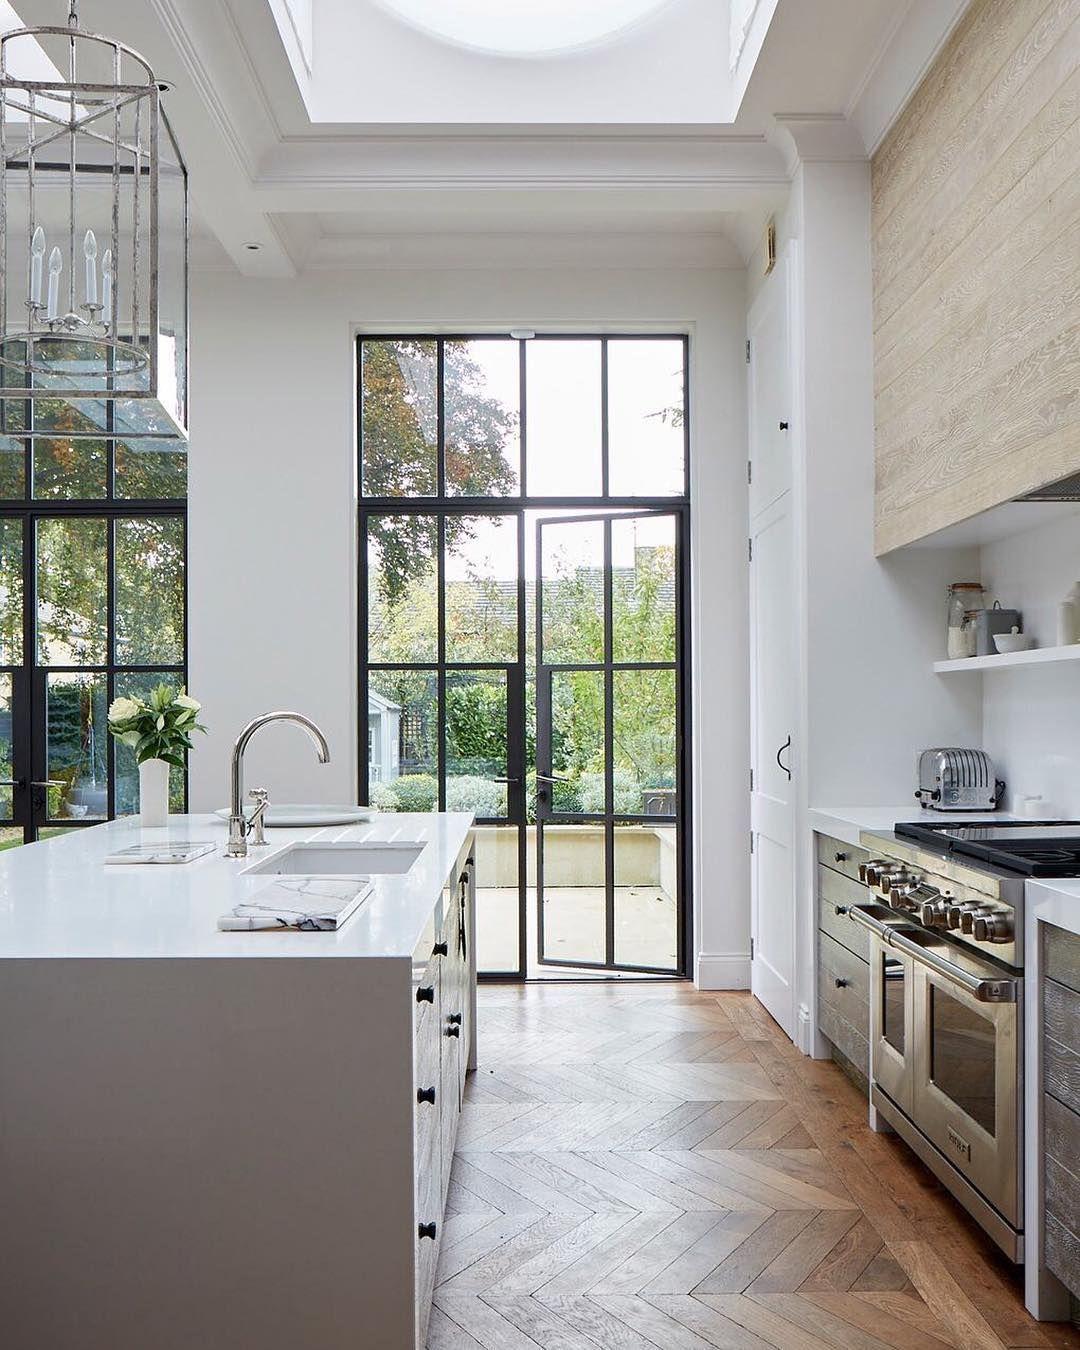 21 Victorian Style Kitchen Design And Ideas: Steel Doors And Chevron Floors